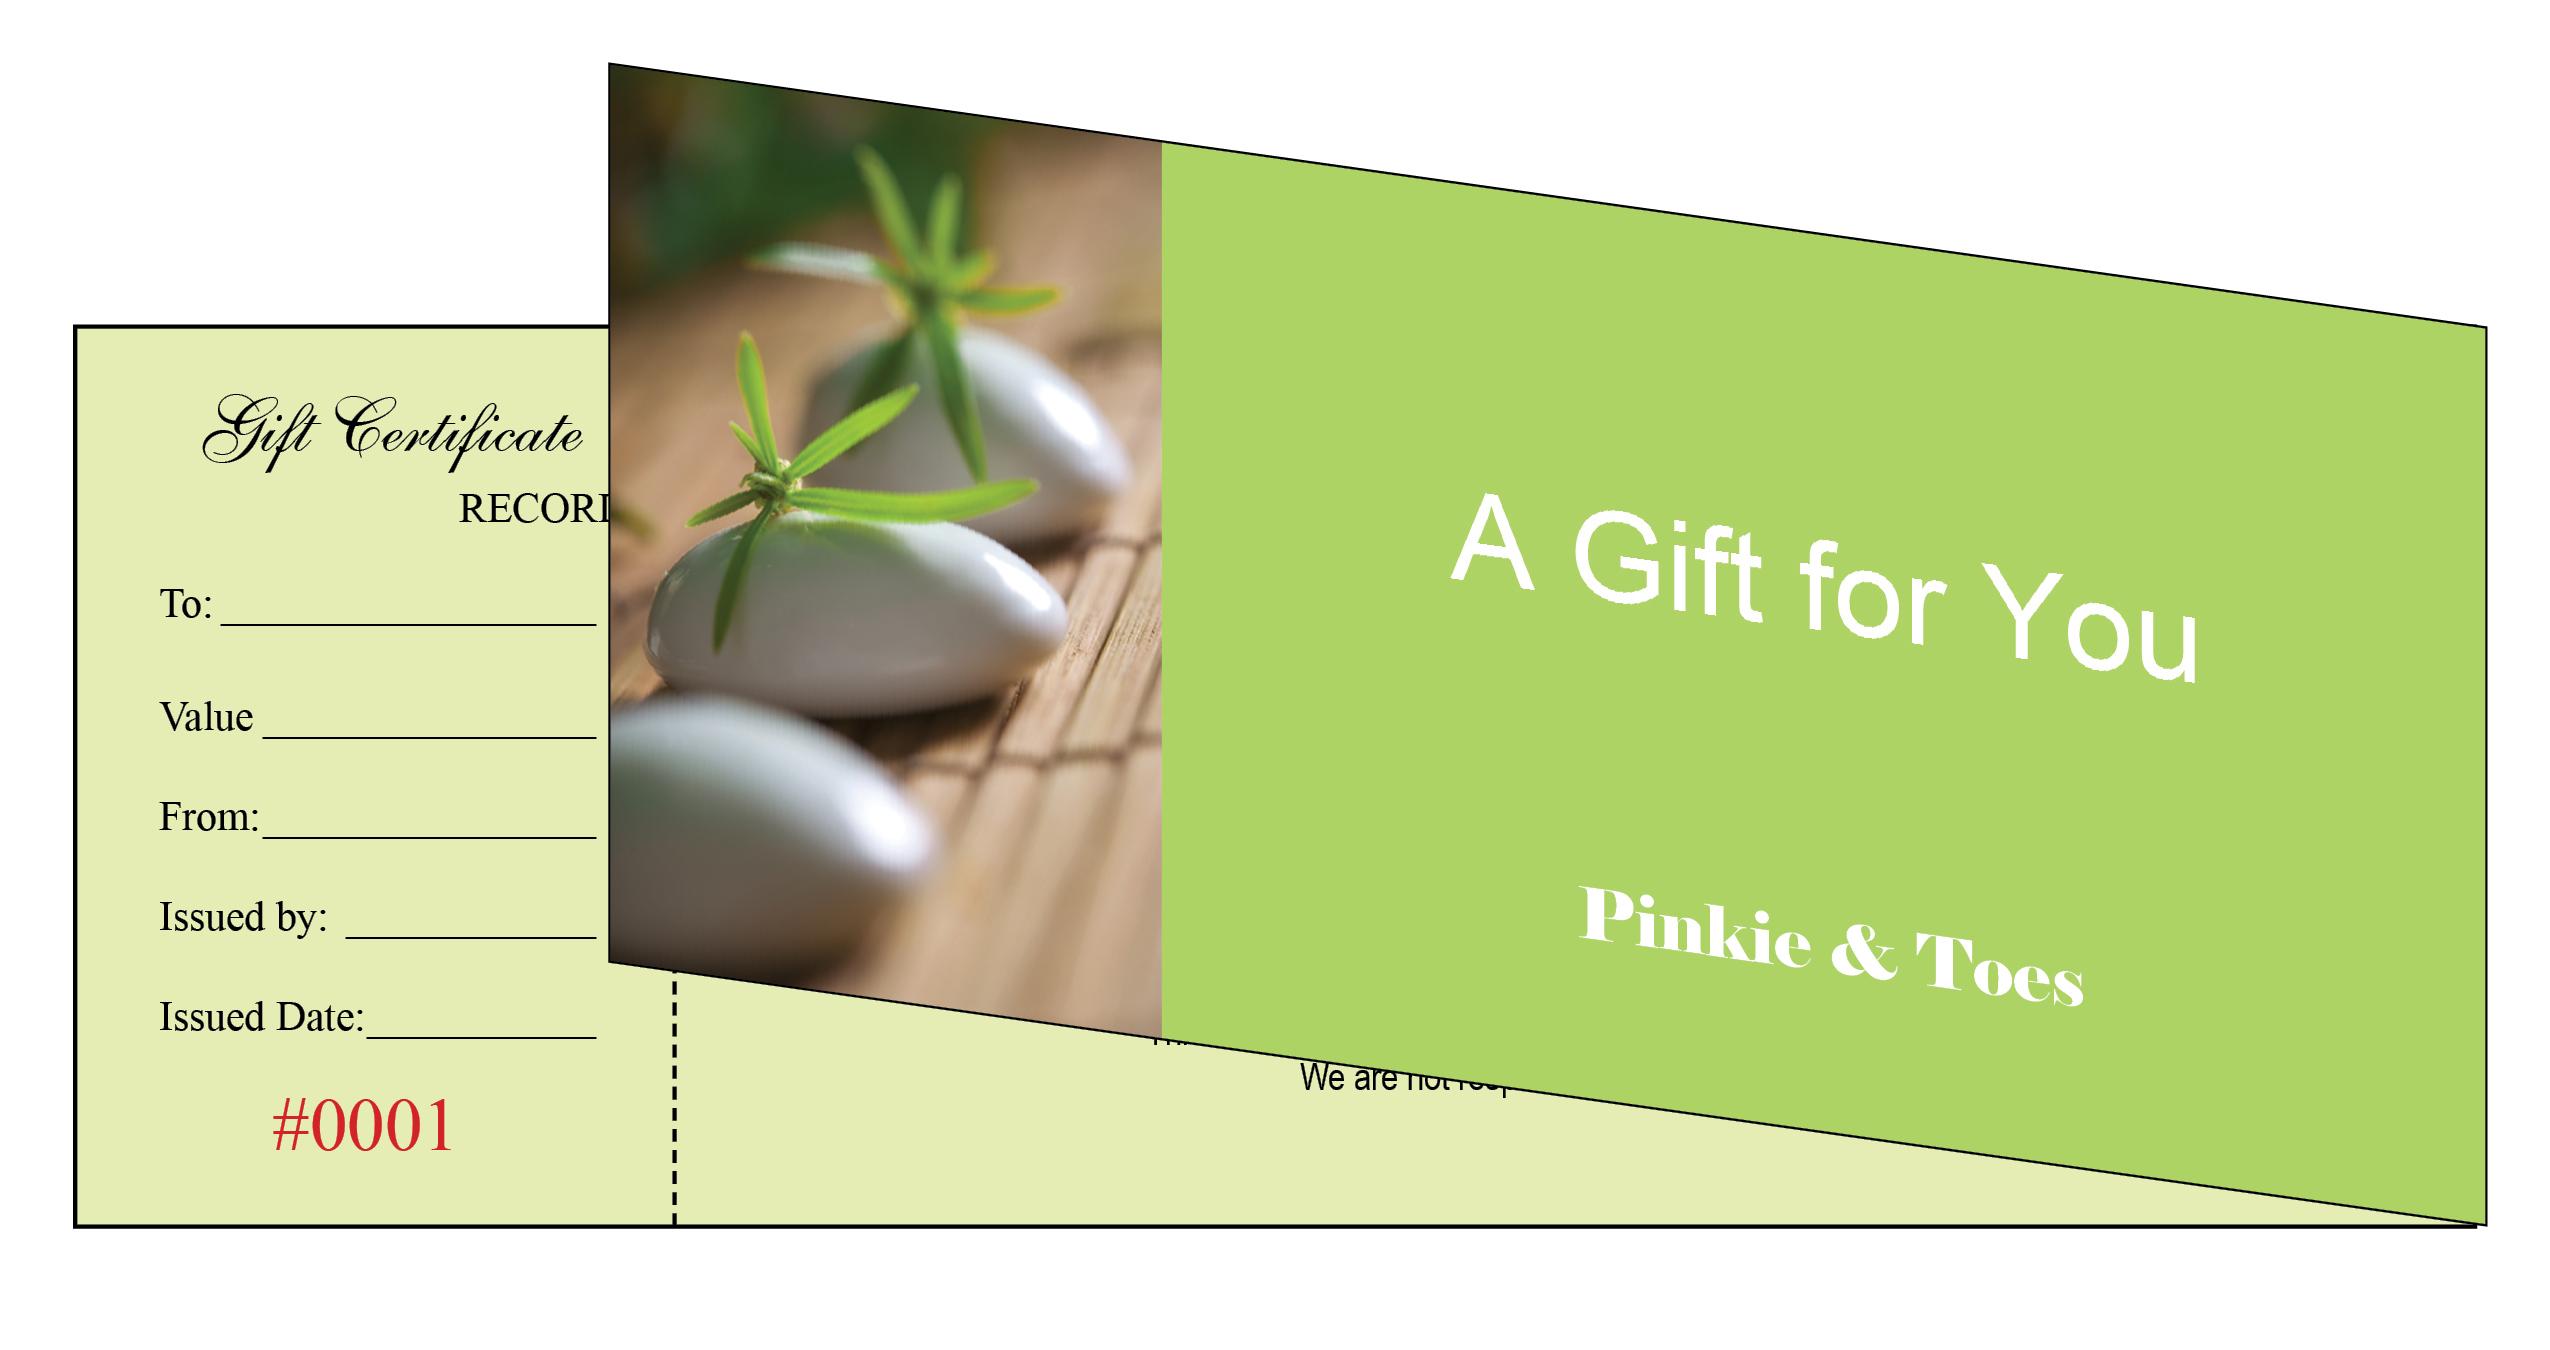 Nail Salon Gift Certificate Printing 119